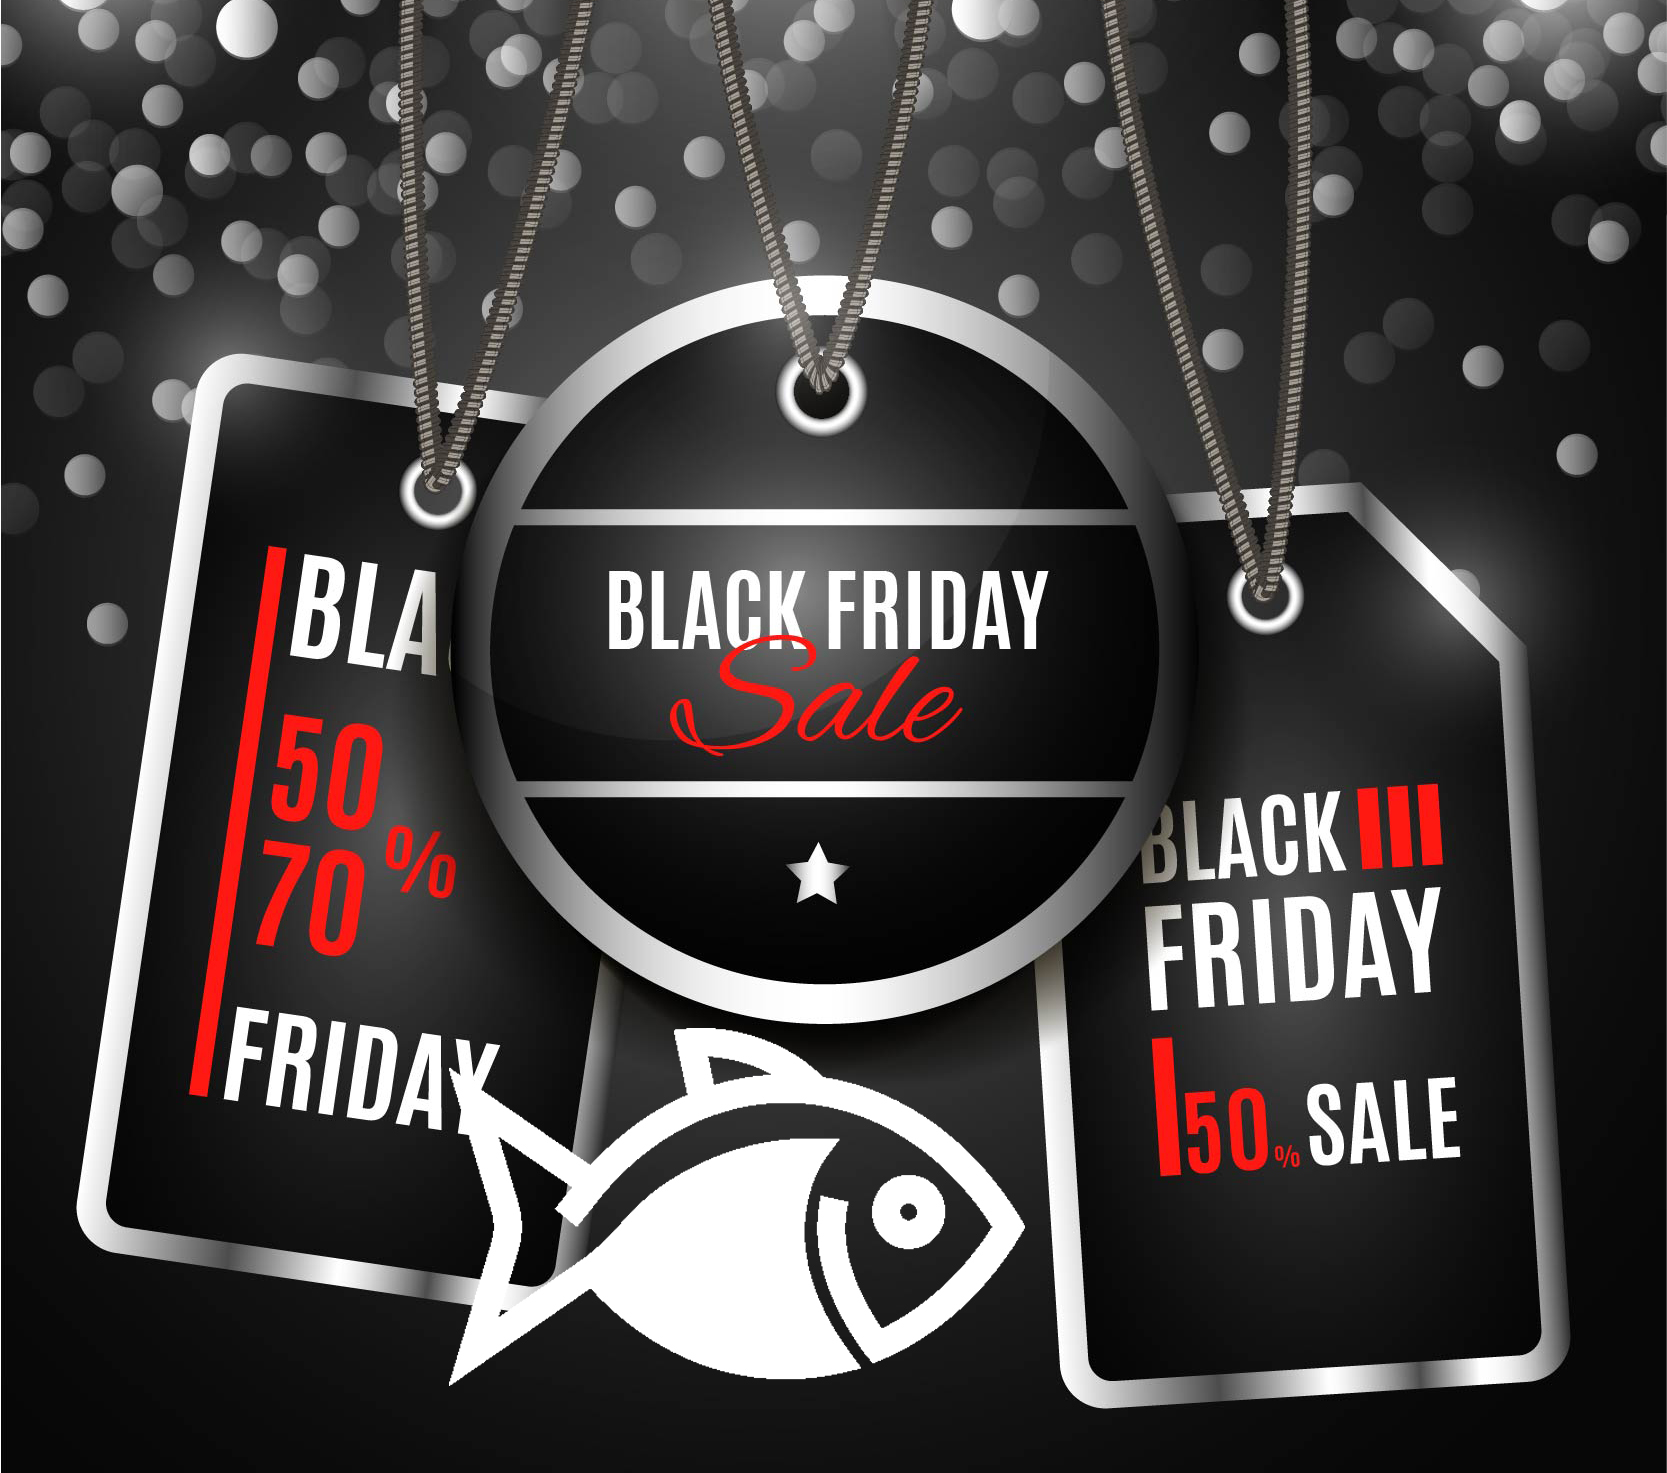 fishing, Black Friday,offer, deals, buy online